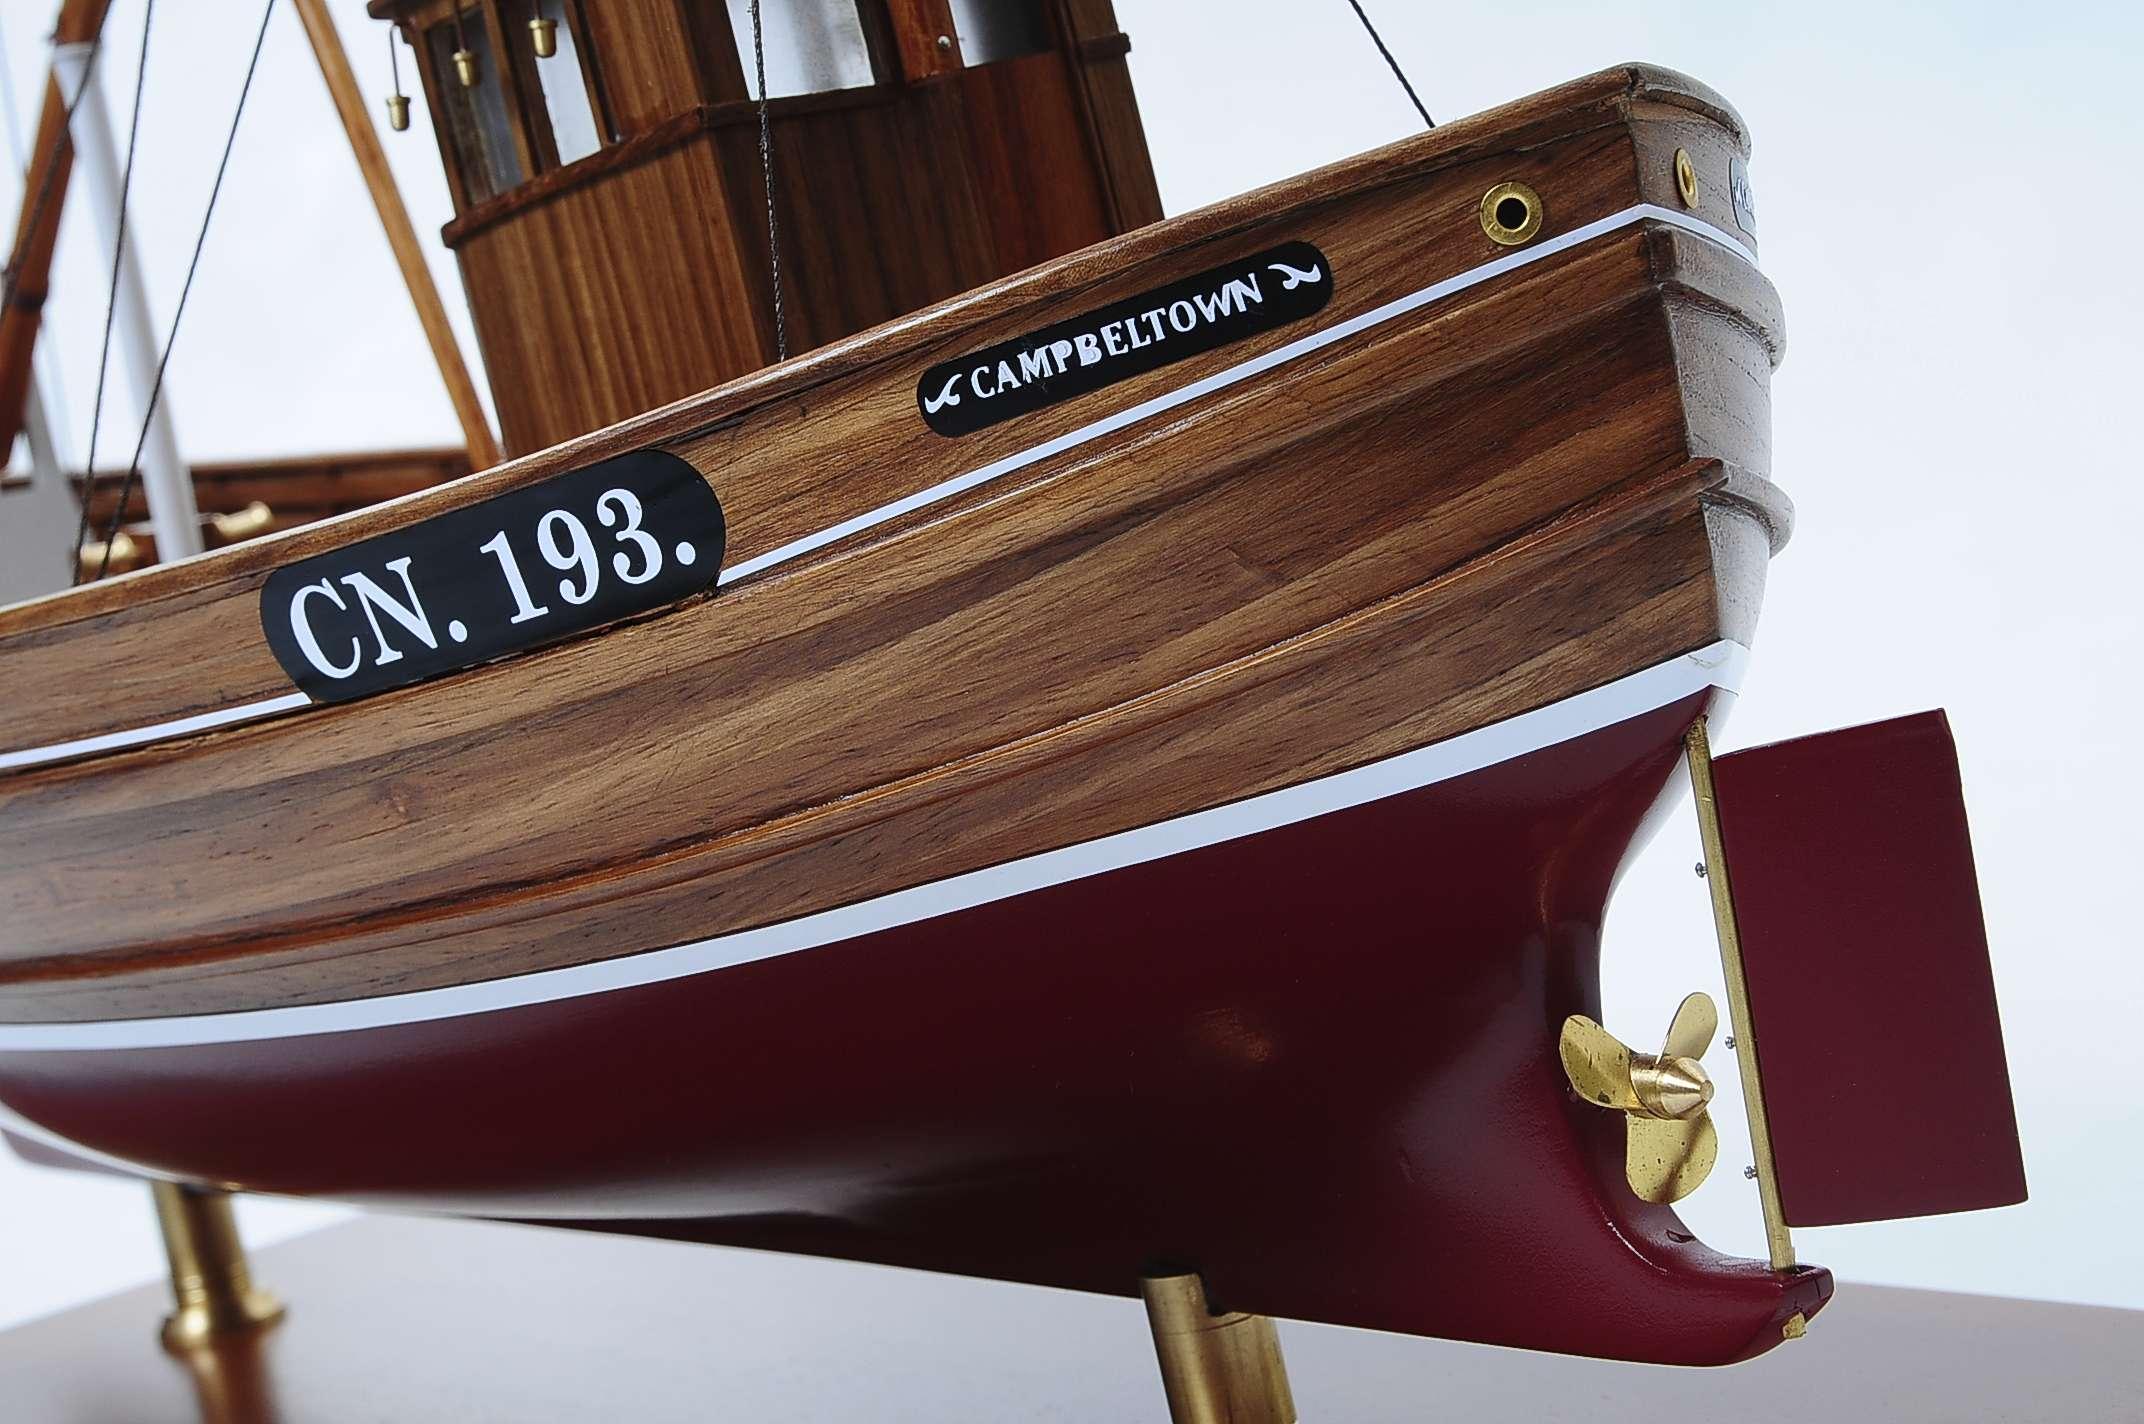 1431-4563-Mary-Mclean-CN193-Model-Boat